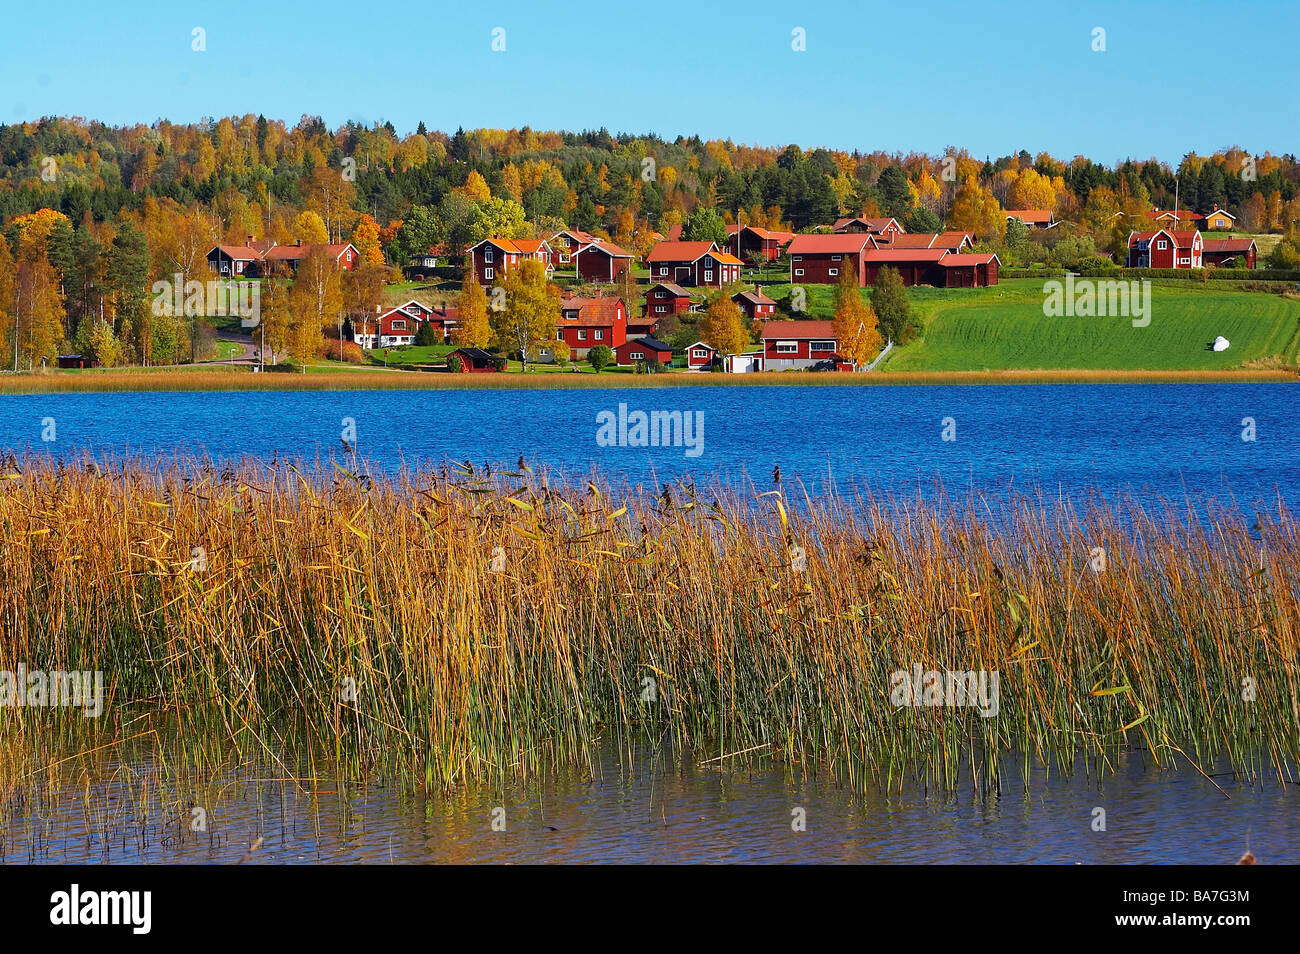 Fall in Leksand at the lake Siljan, Dalarna, middle Sweden - Stock Image